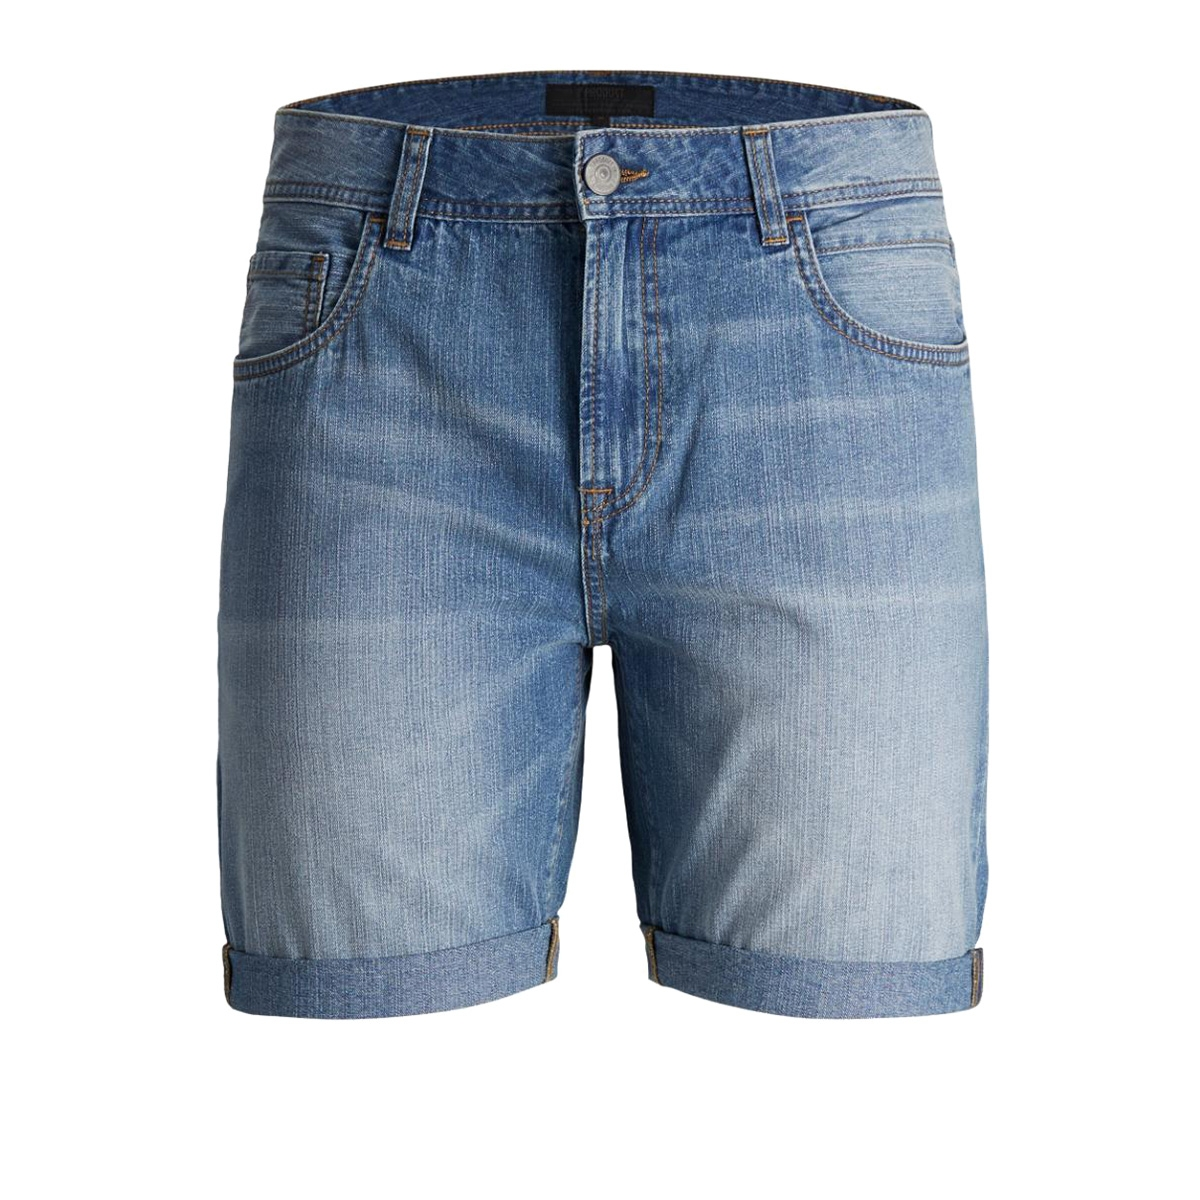 pktakm reg shorts b-59 12134572 produkt korte broek light blue denim